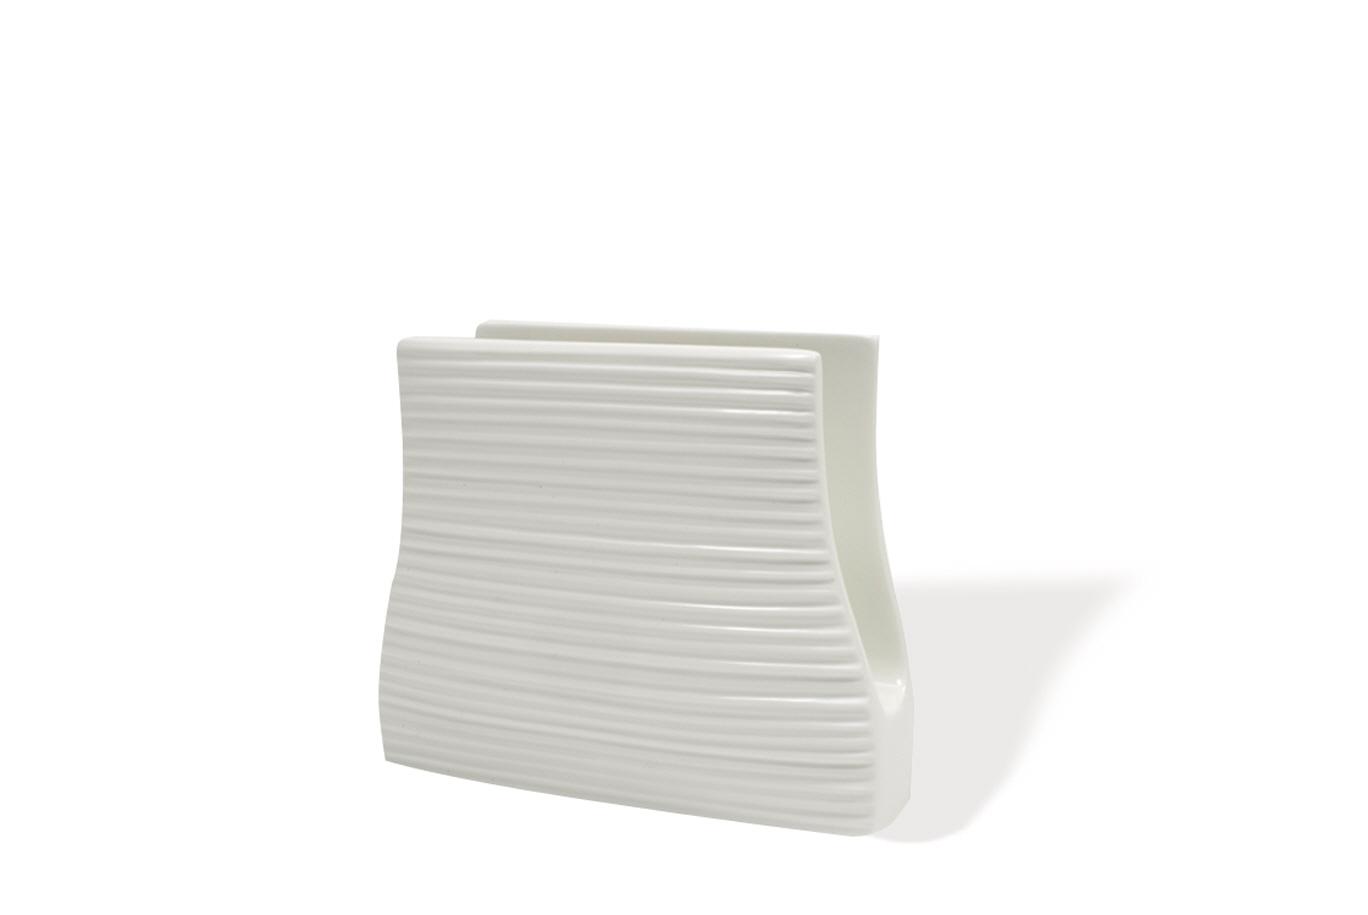 Stojan na ubrousky White Basics Cirque 13,5 x 12,5 cm - Maxwell&Willia